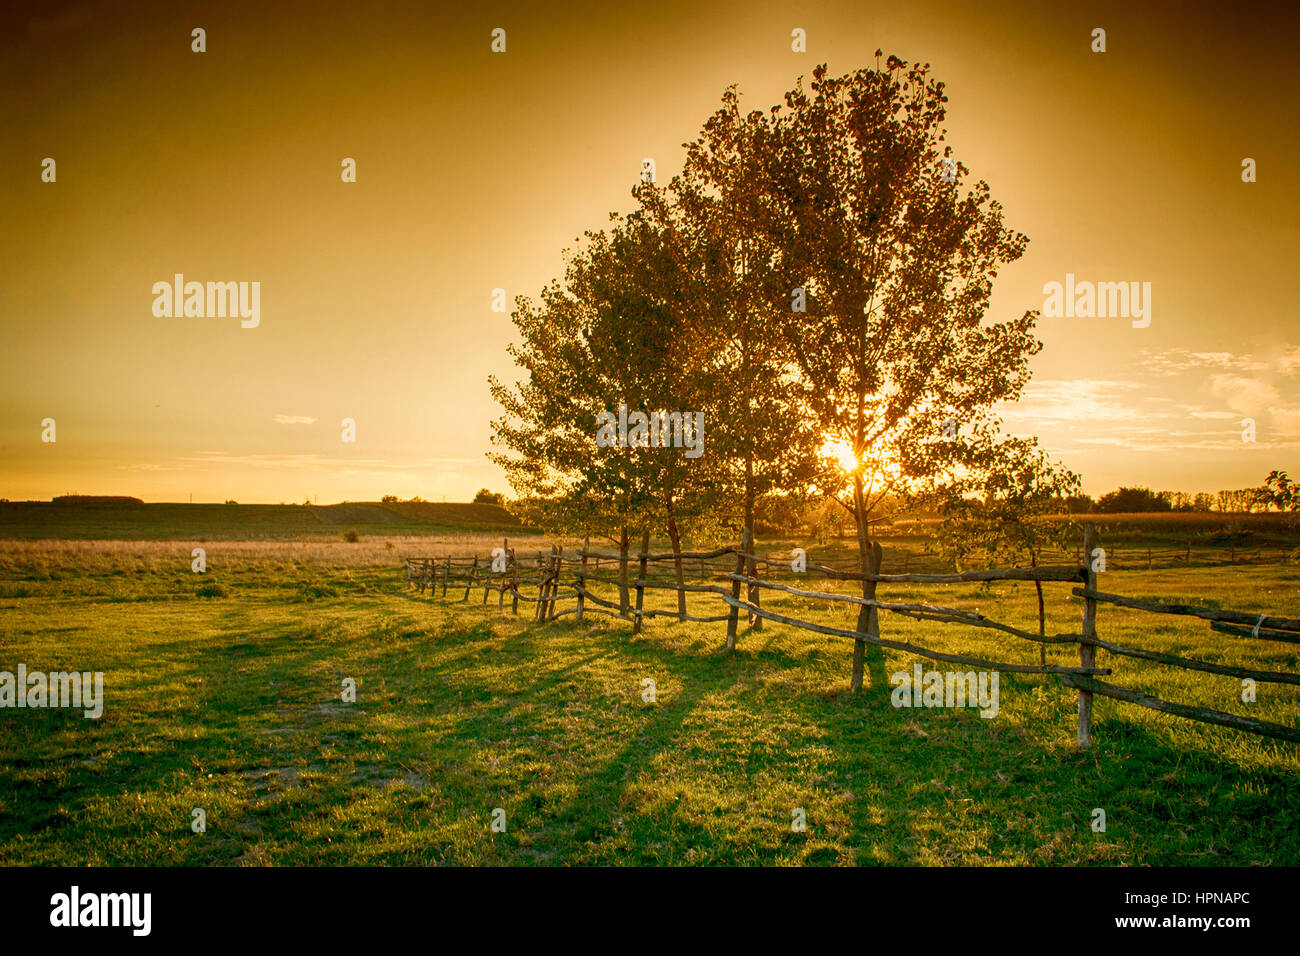 Farmland in sunset - Stock Image